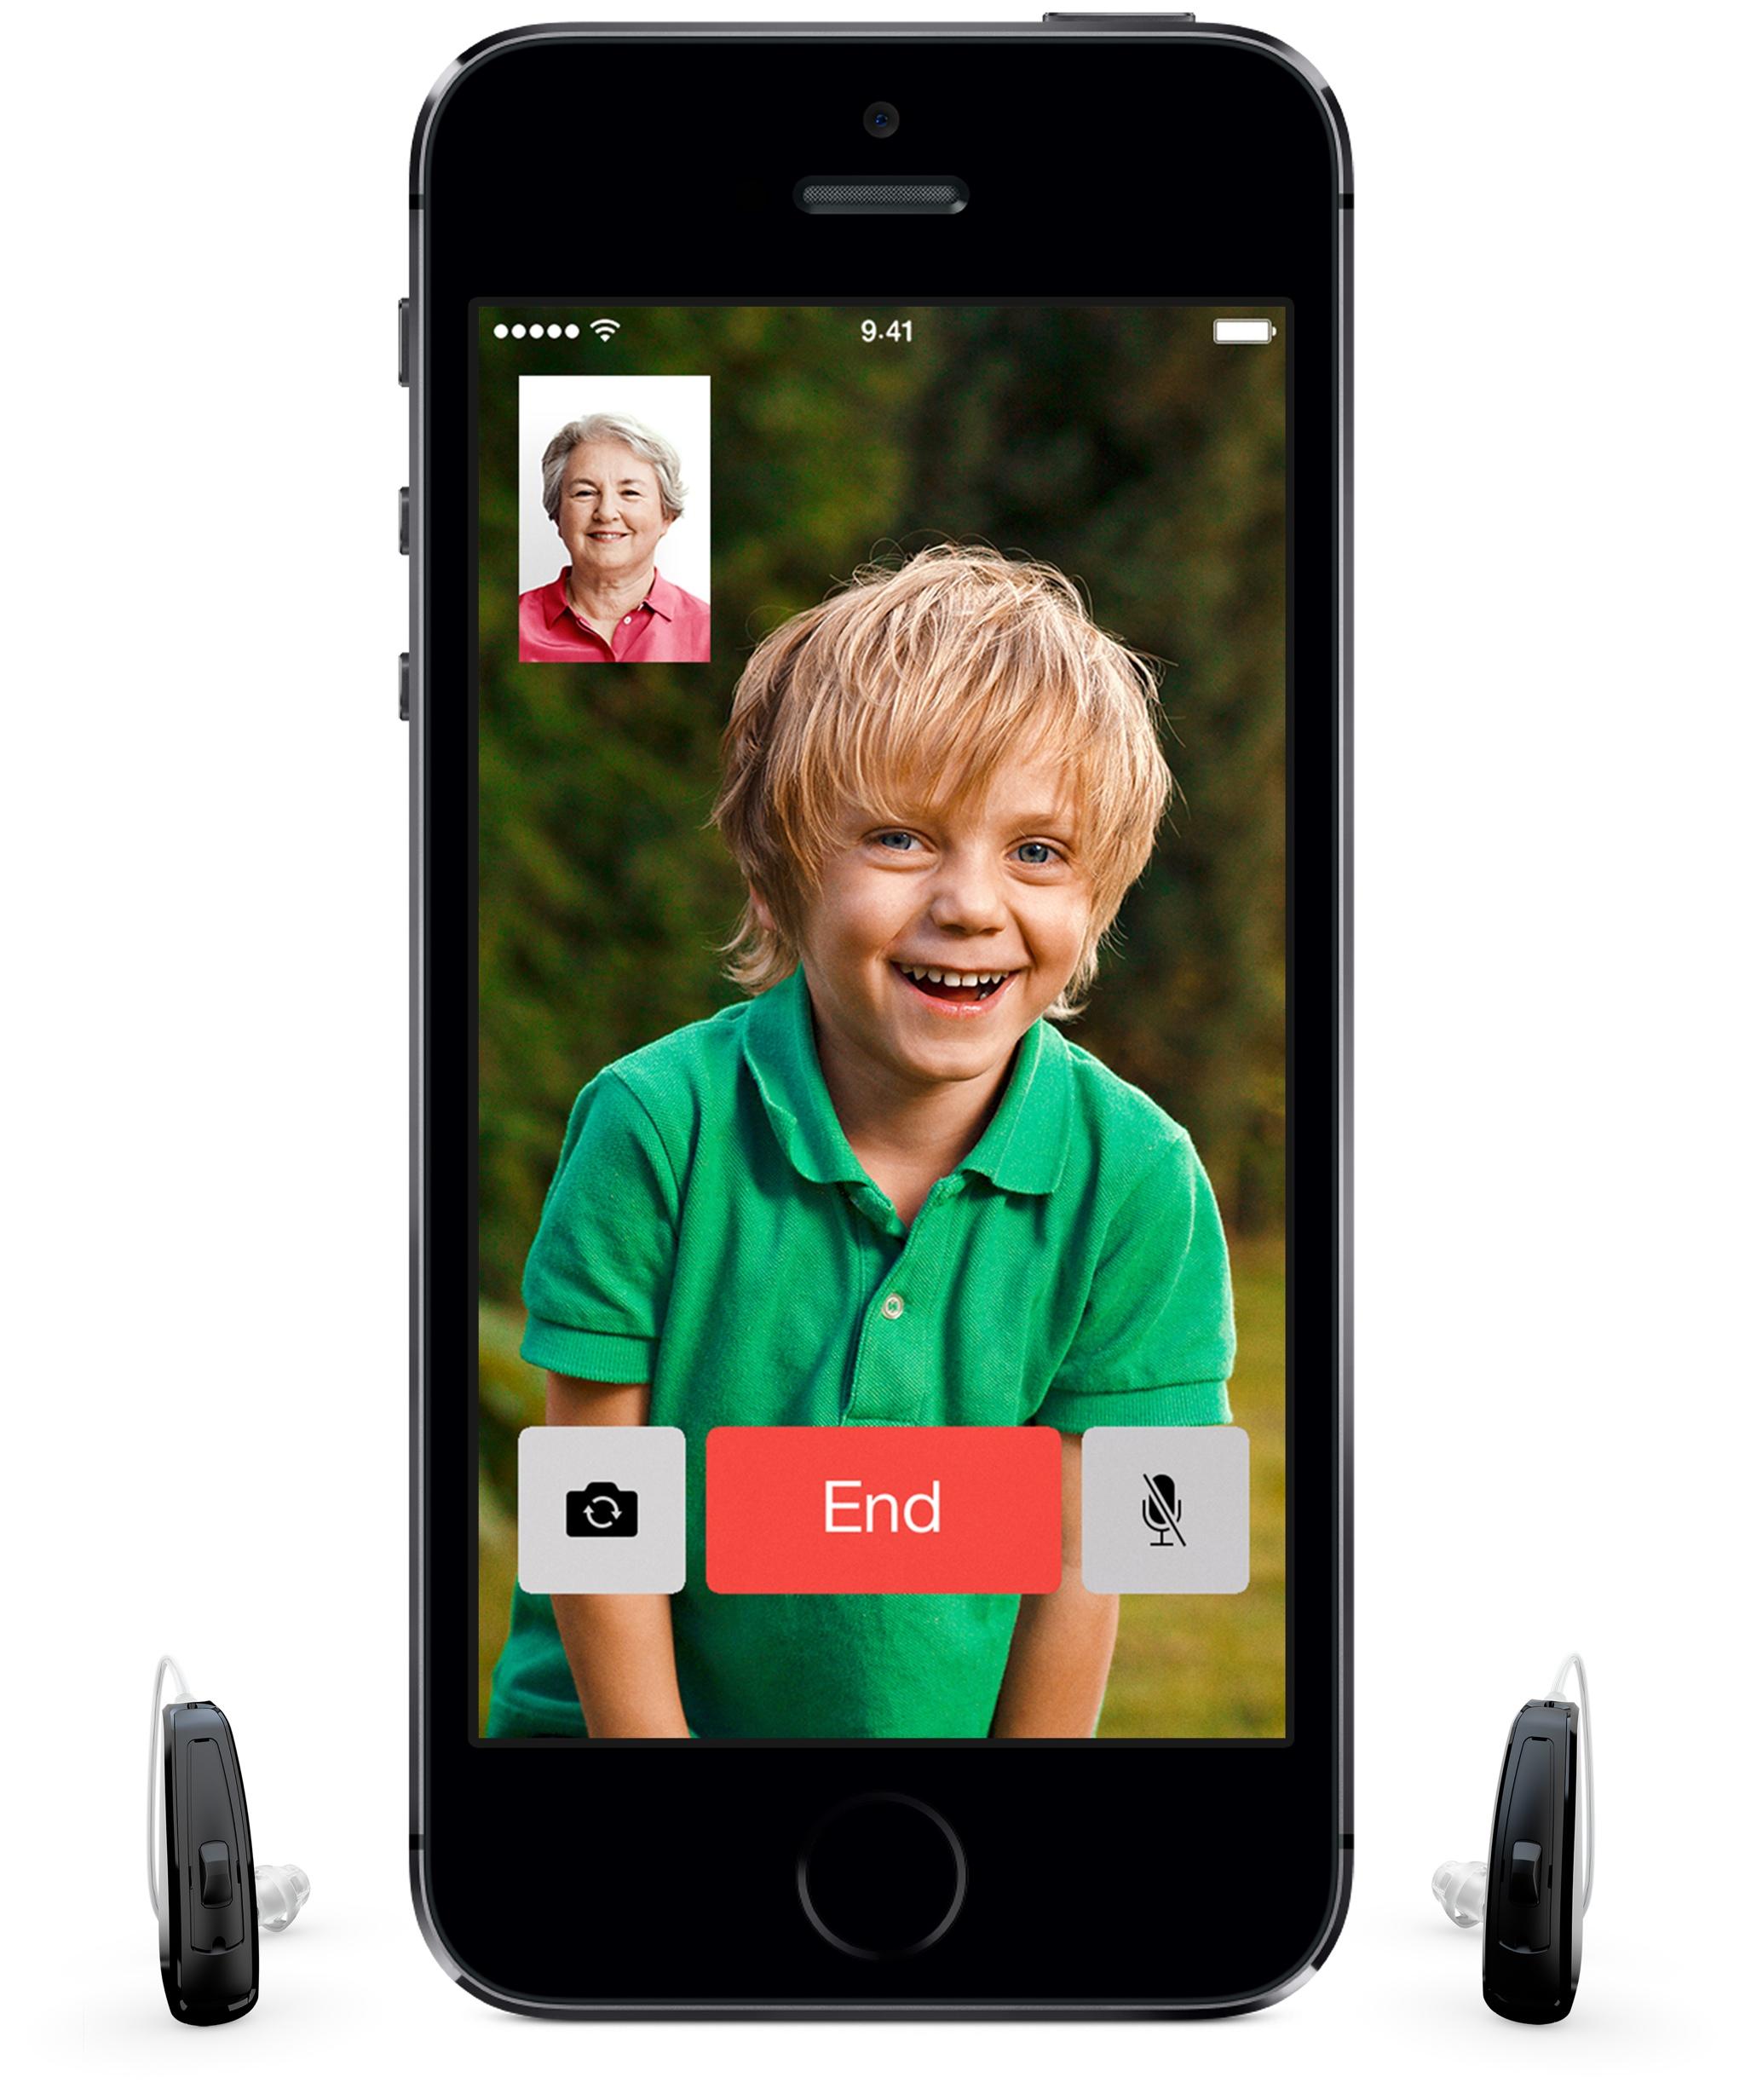 ReSound LiNXLNHearing AidsiPhone